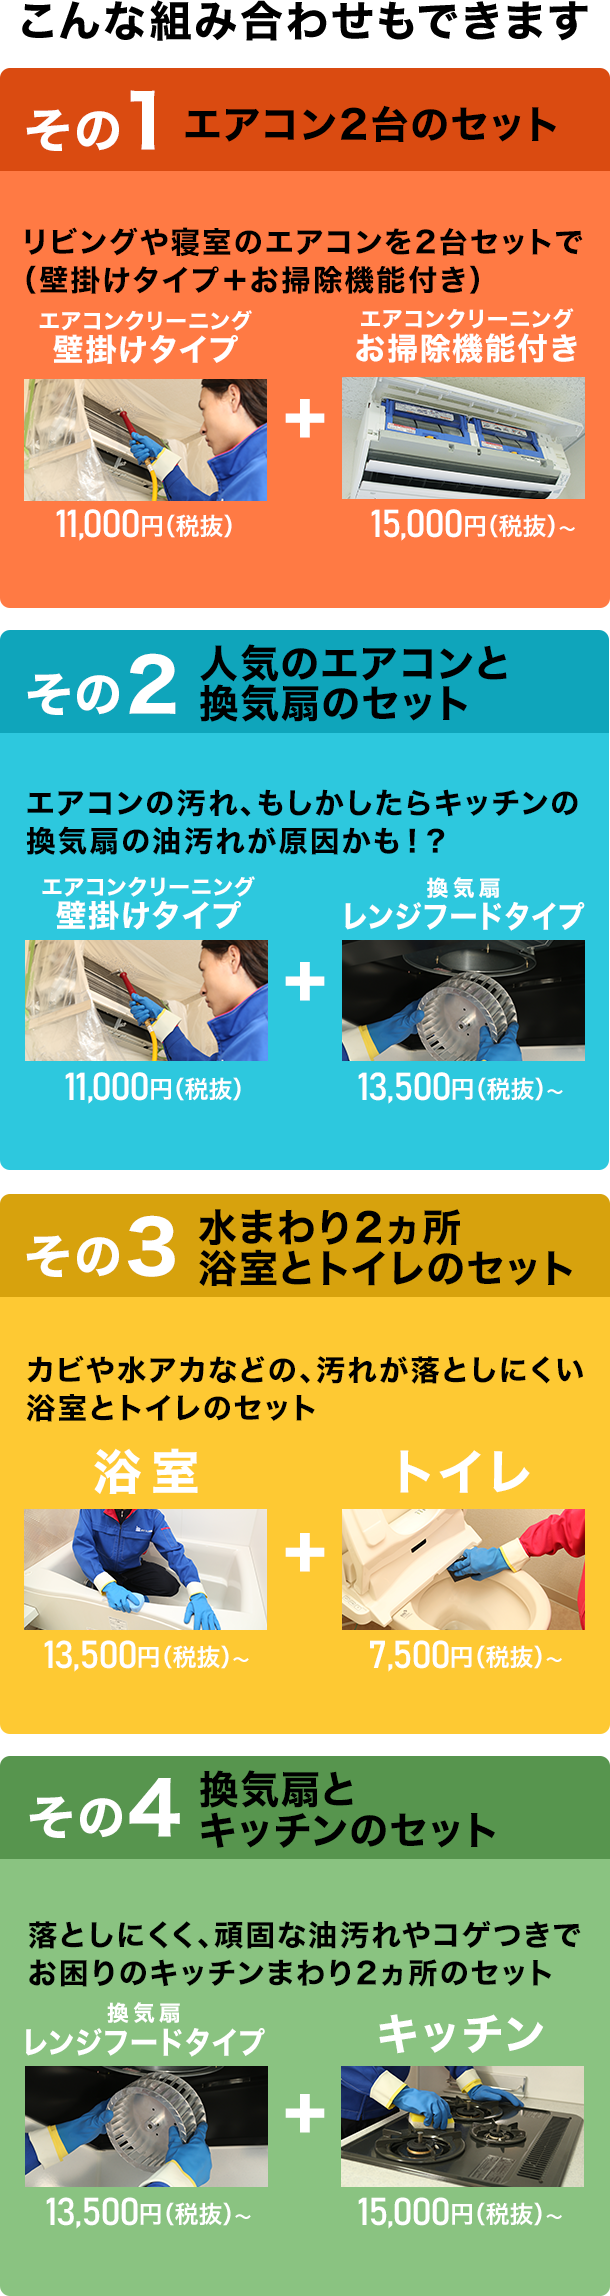 sp_19-09_02-1